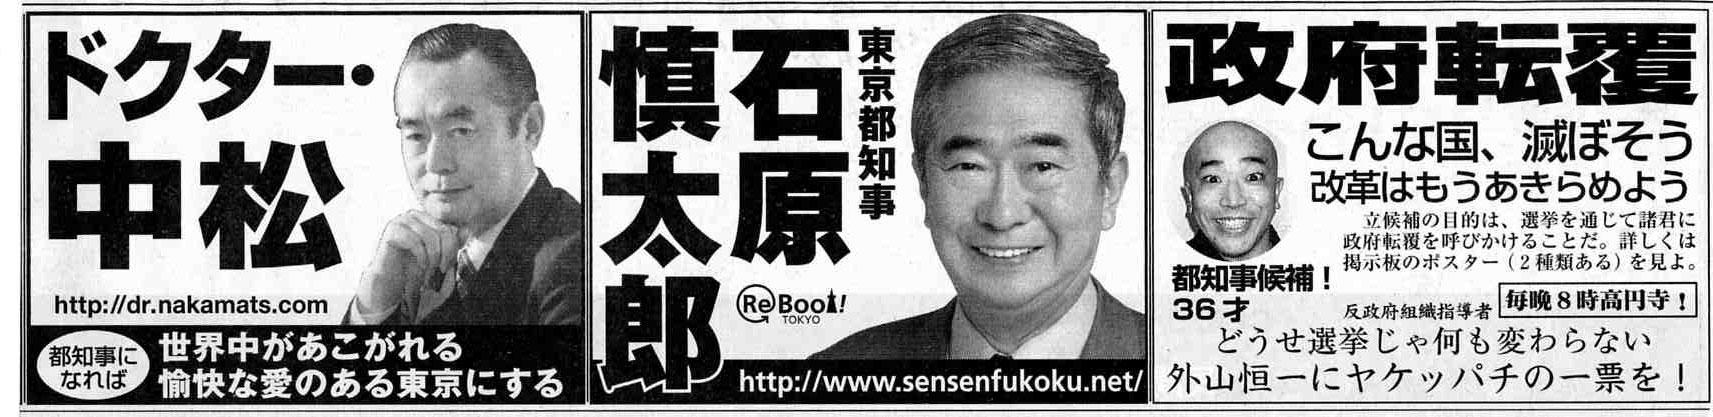 http://www.dgcr.com/kiji/20070402/senkyo